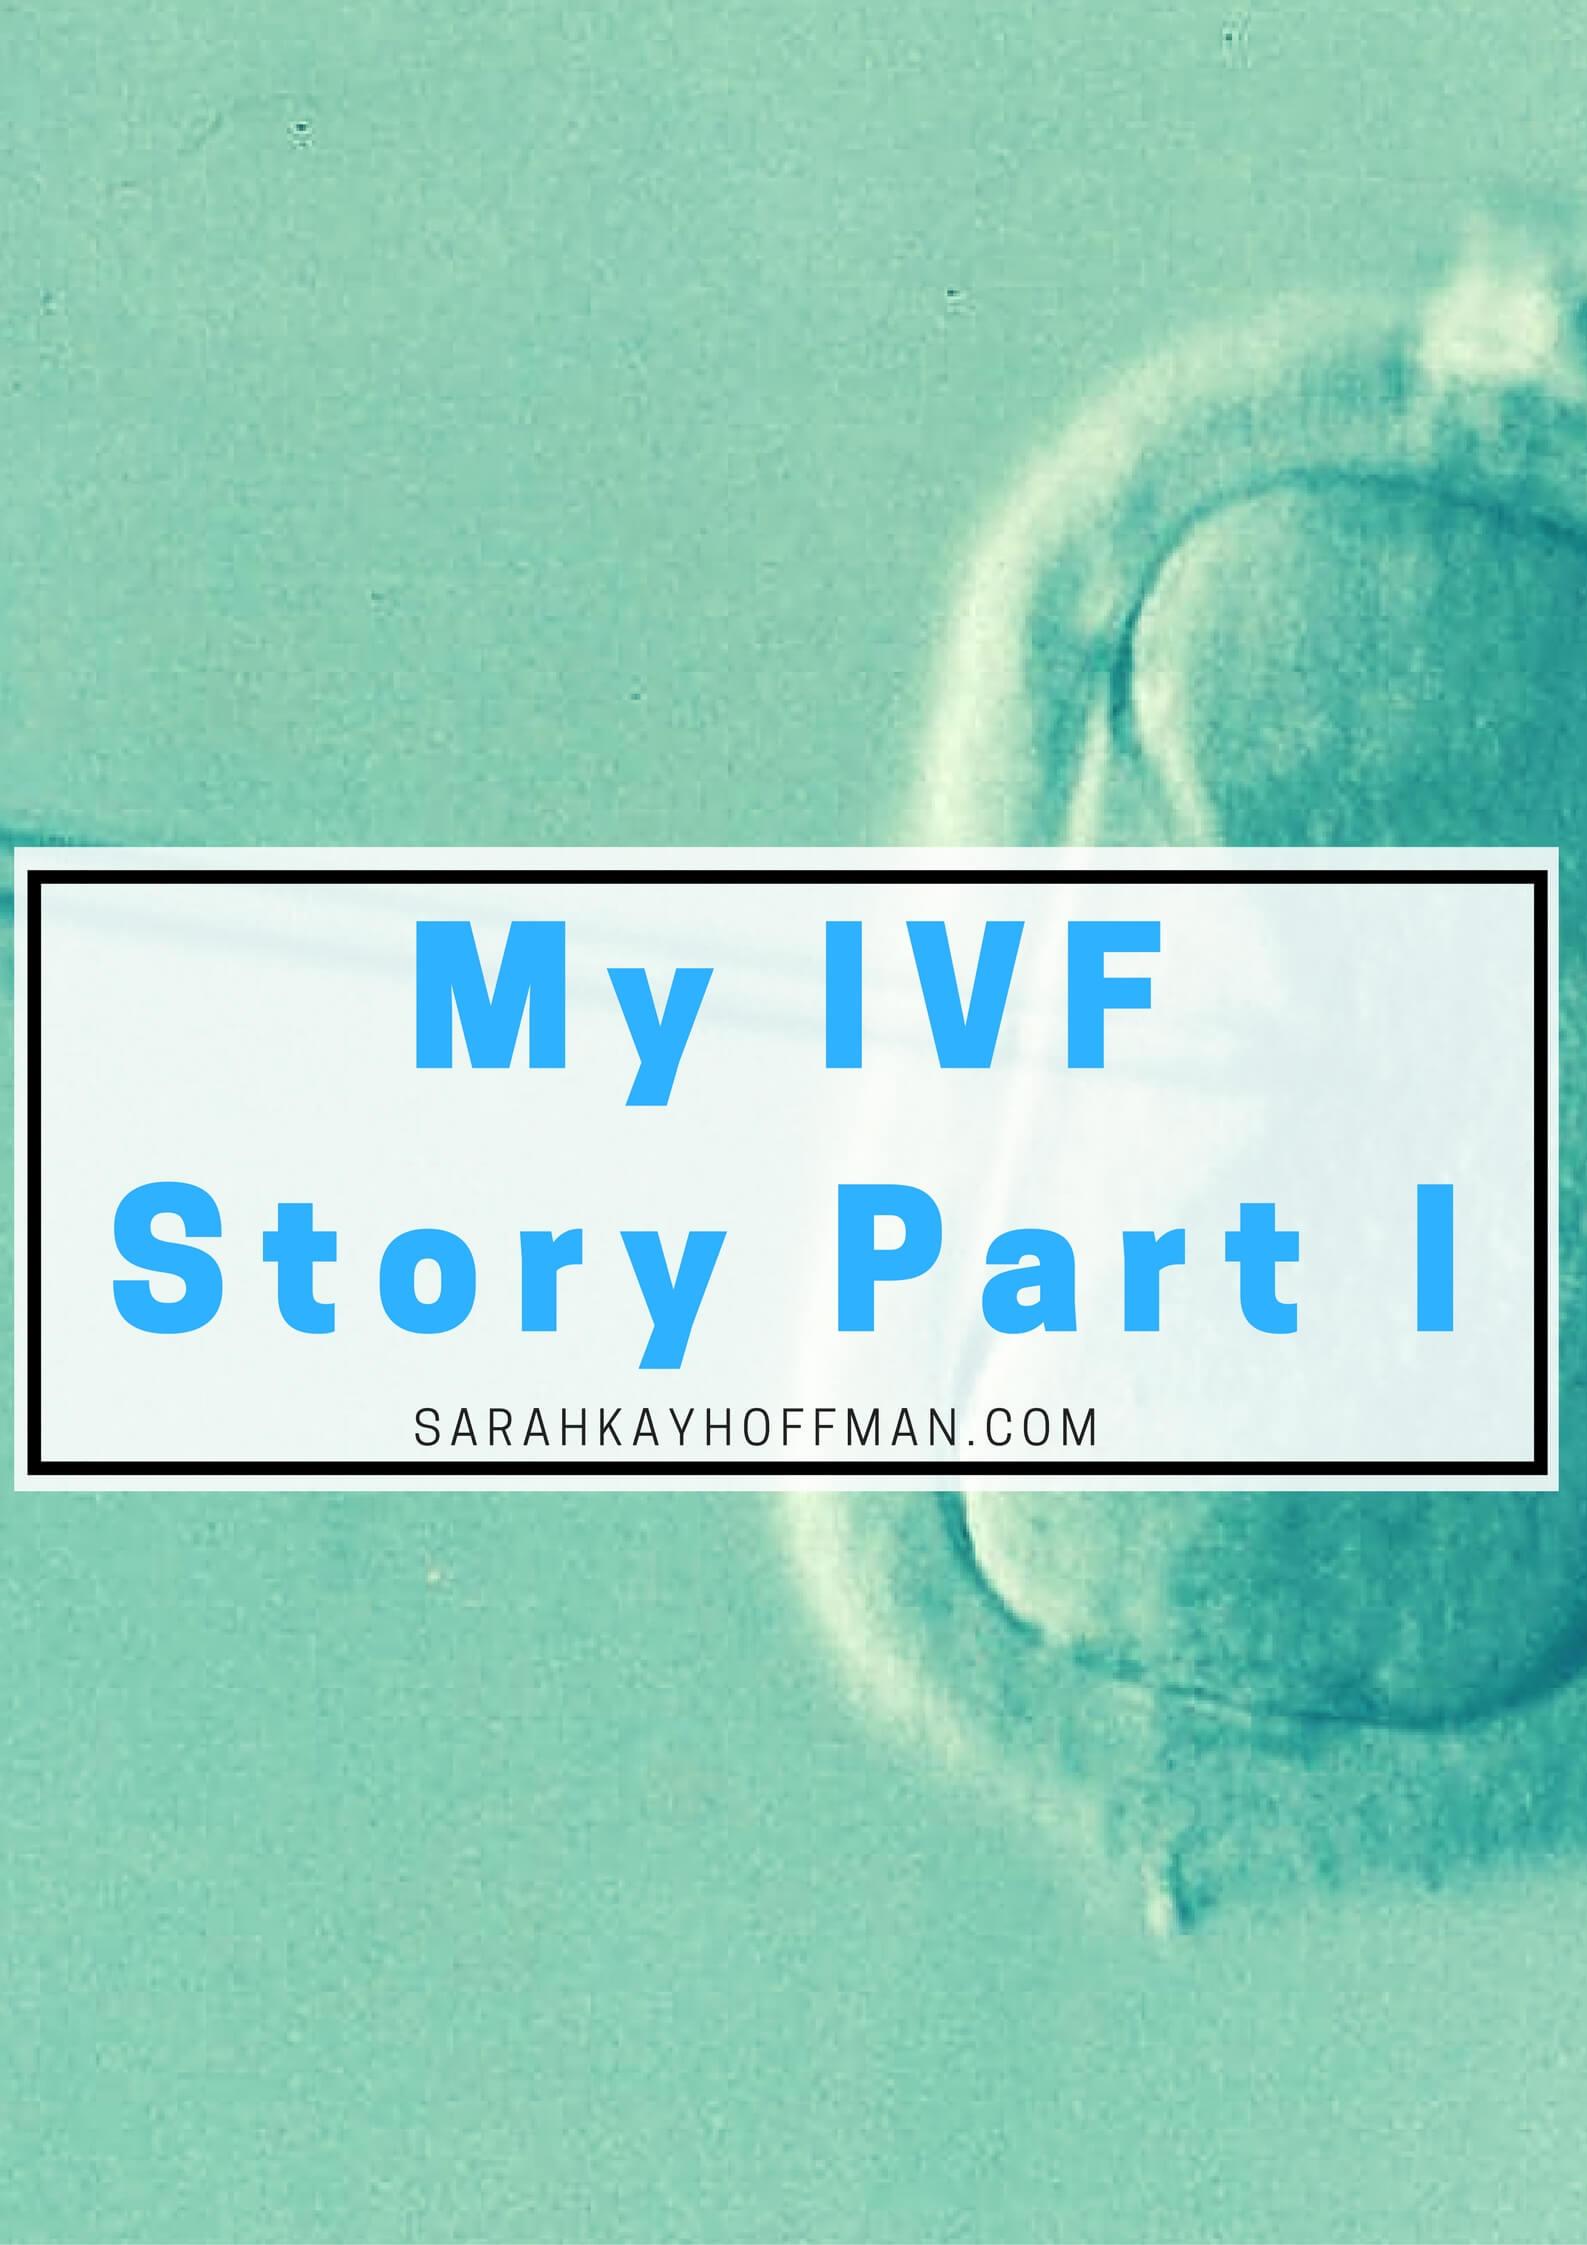 My IVF Story Part I sarahkayhoffman.com Infertility